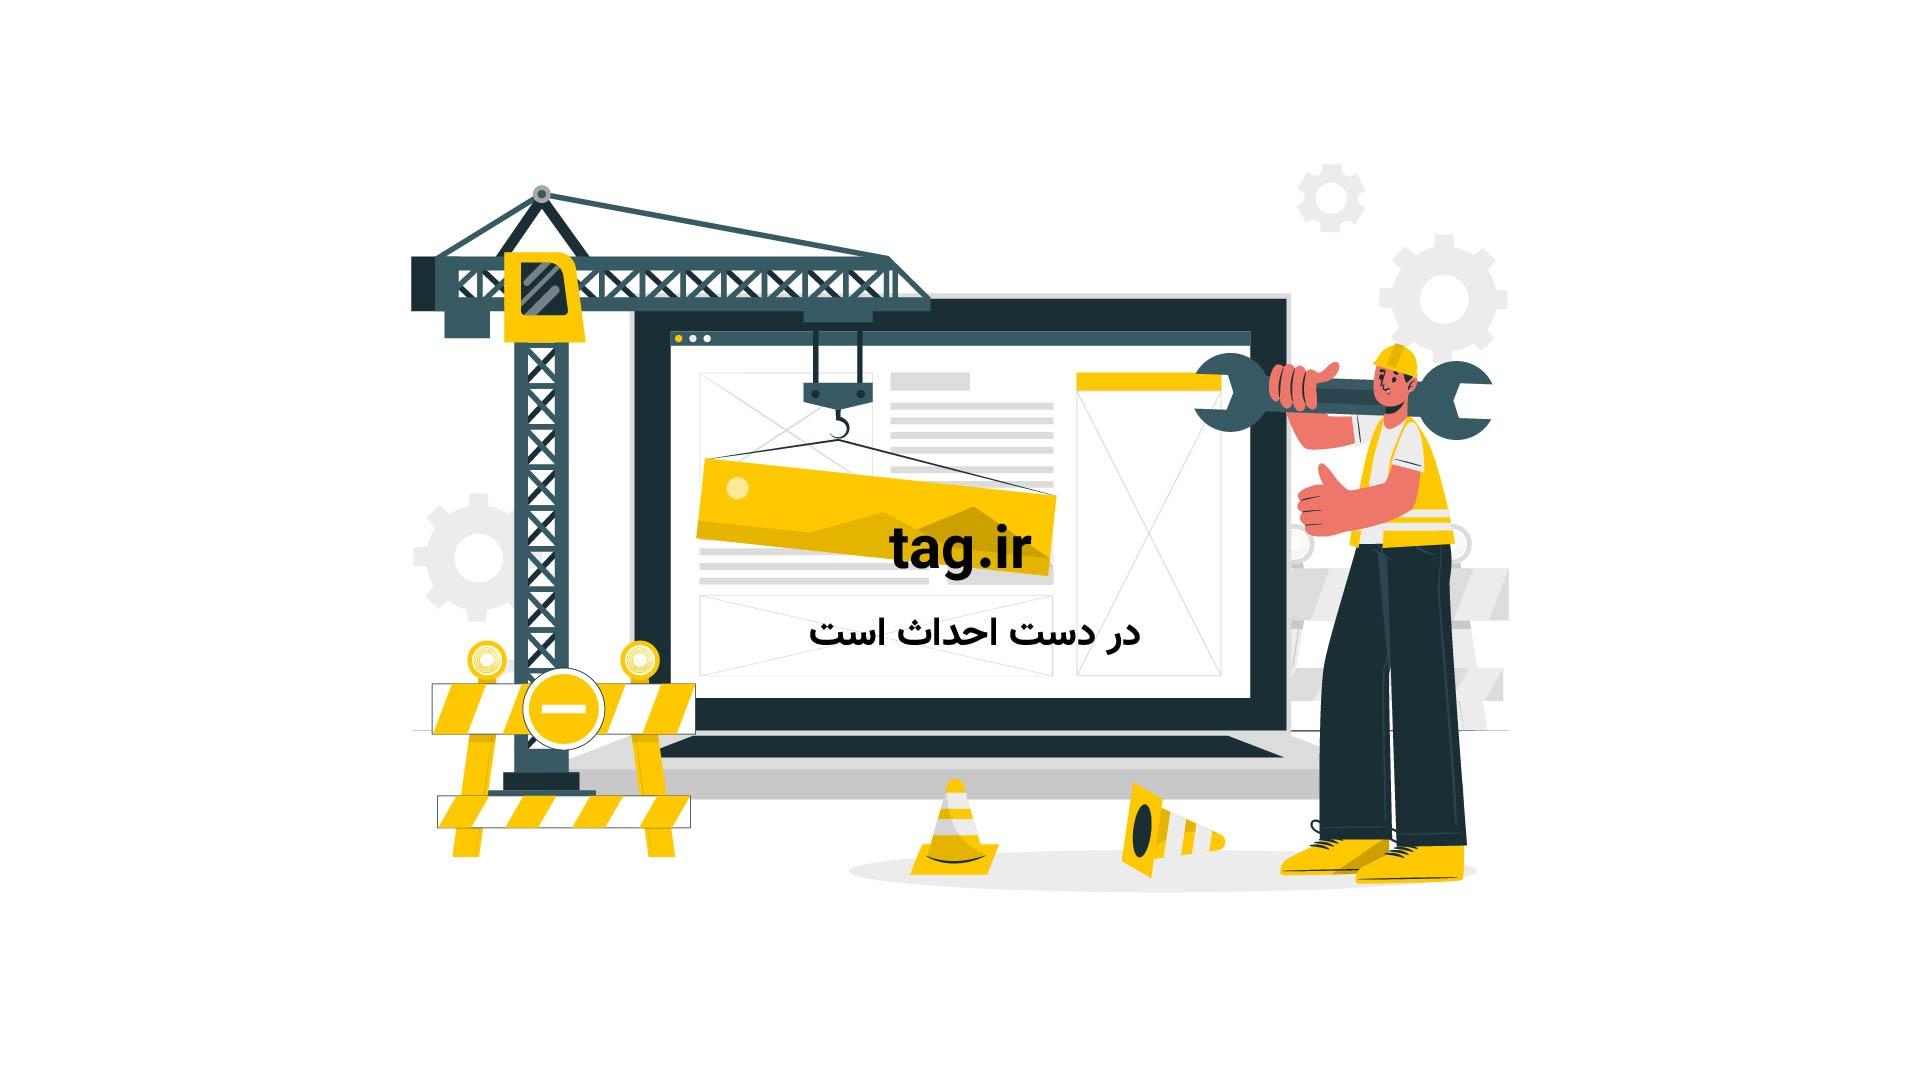 چالش مانکن لبران جیمز و کلیولند کاوالییرز به همراه میشل اوباما | فیلم